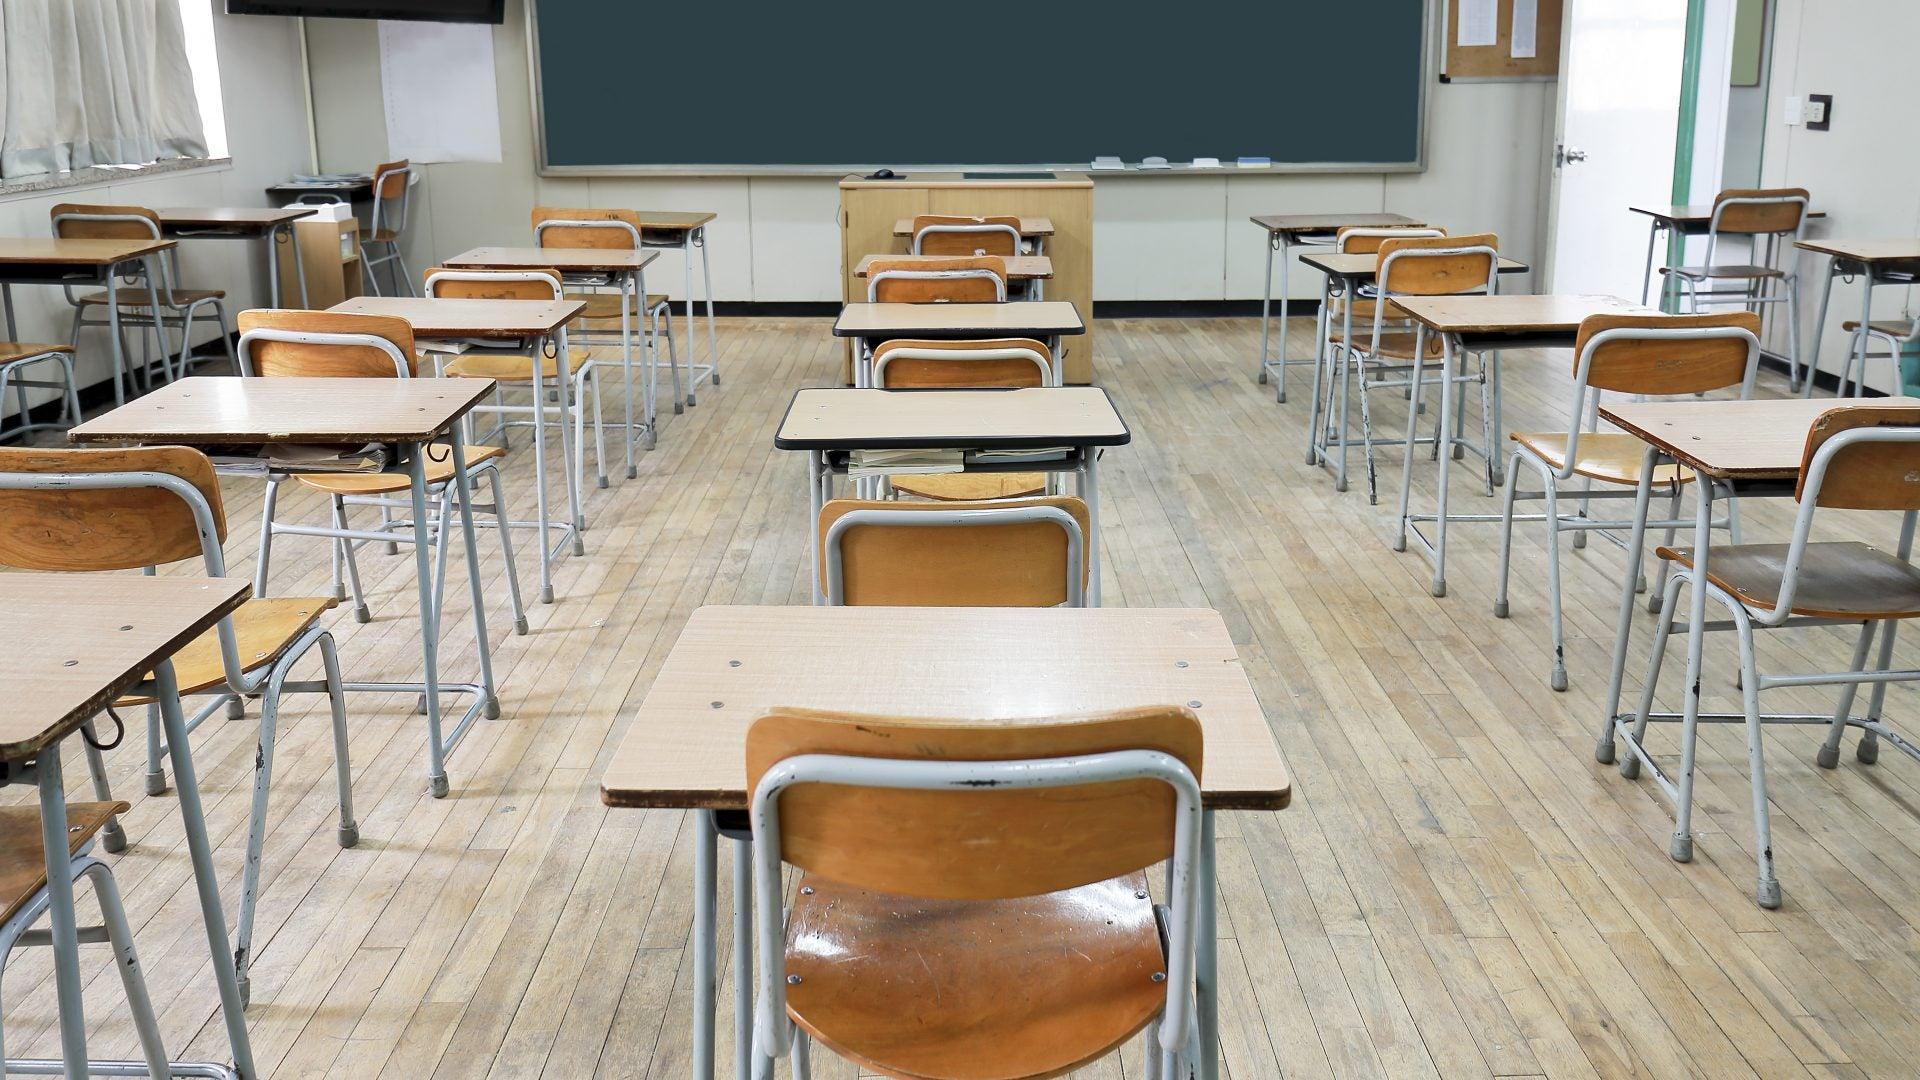 Florida Teacher Whitesplains His Right To Use The N-Word